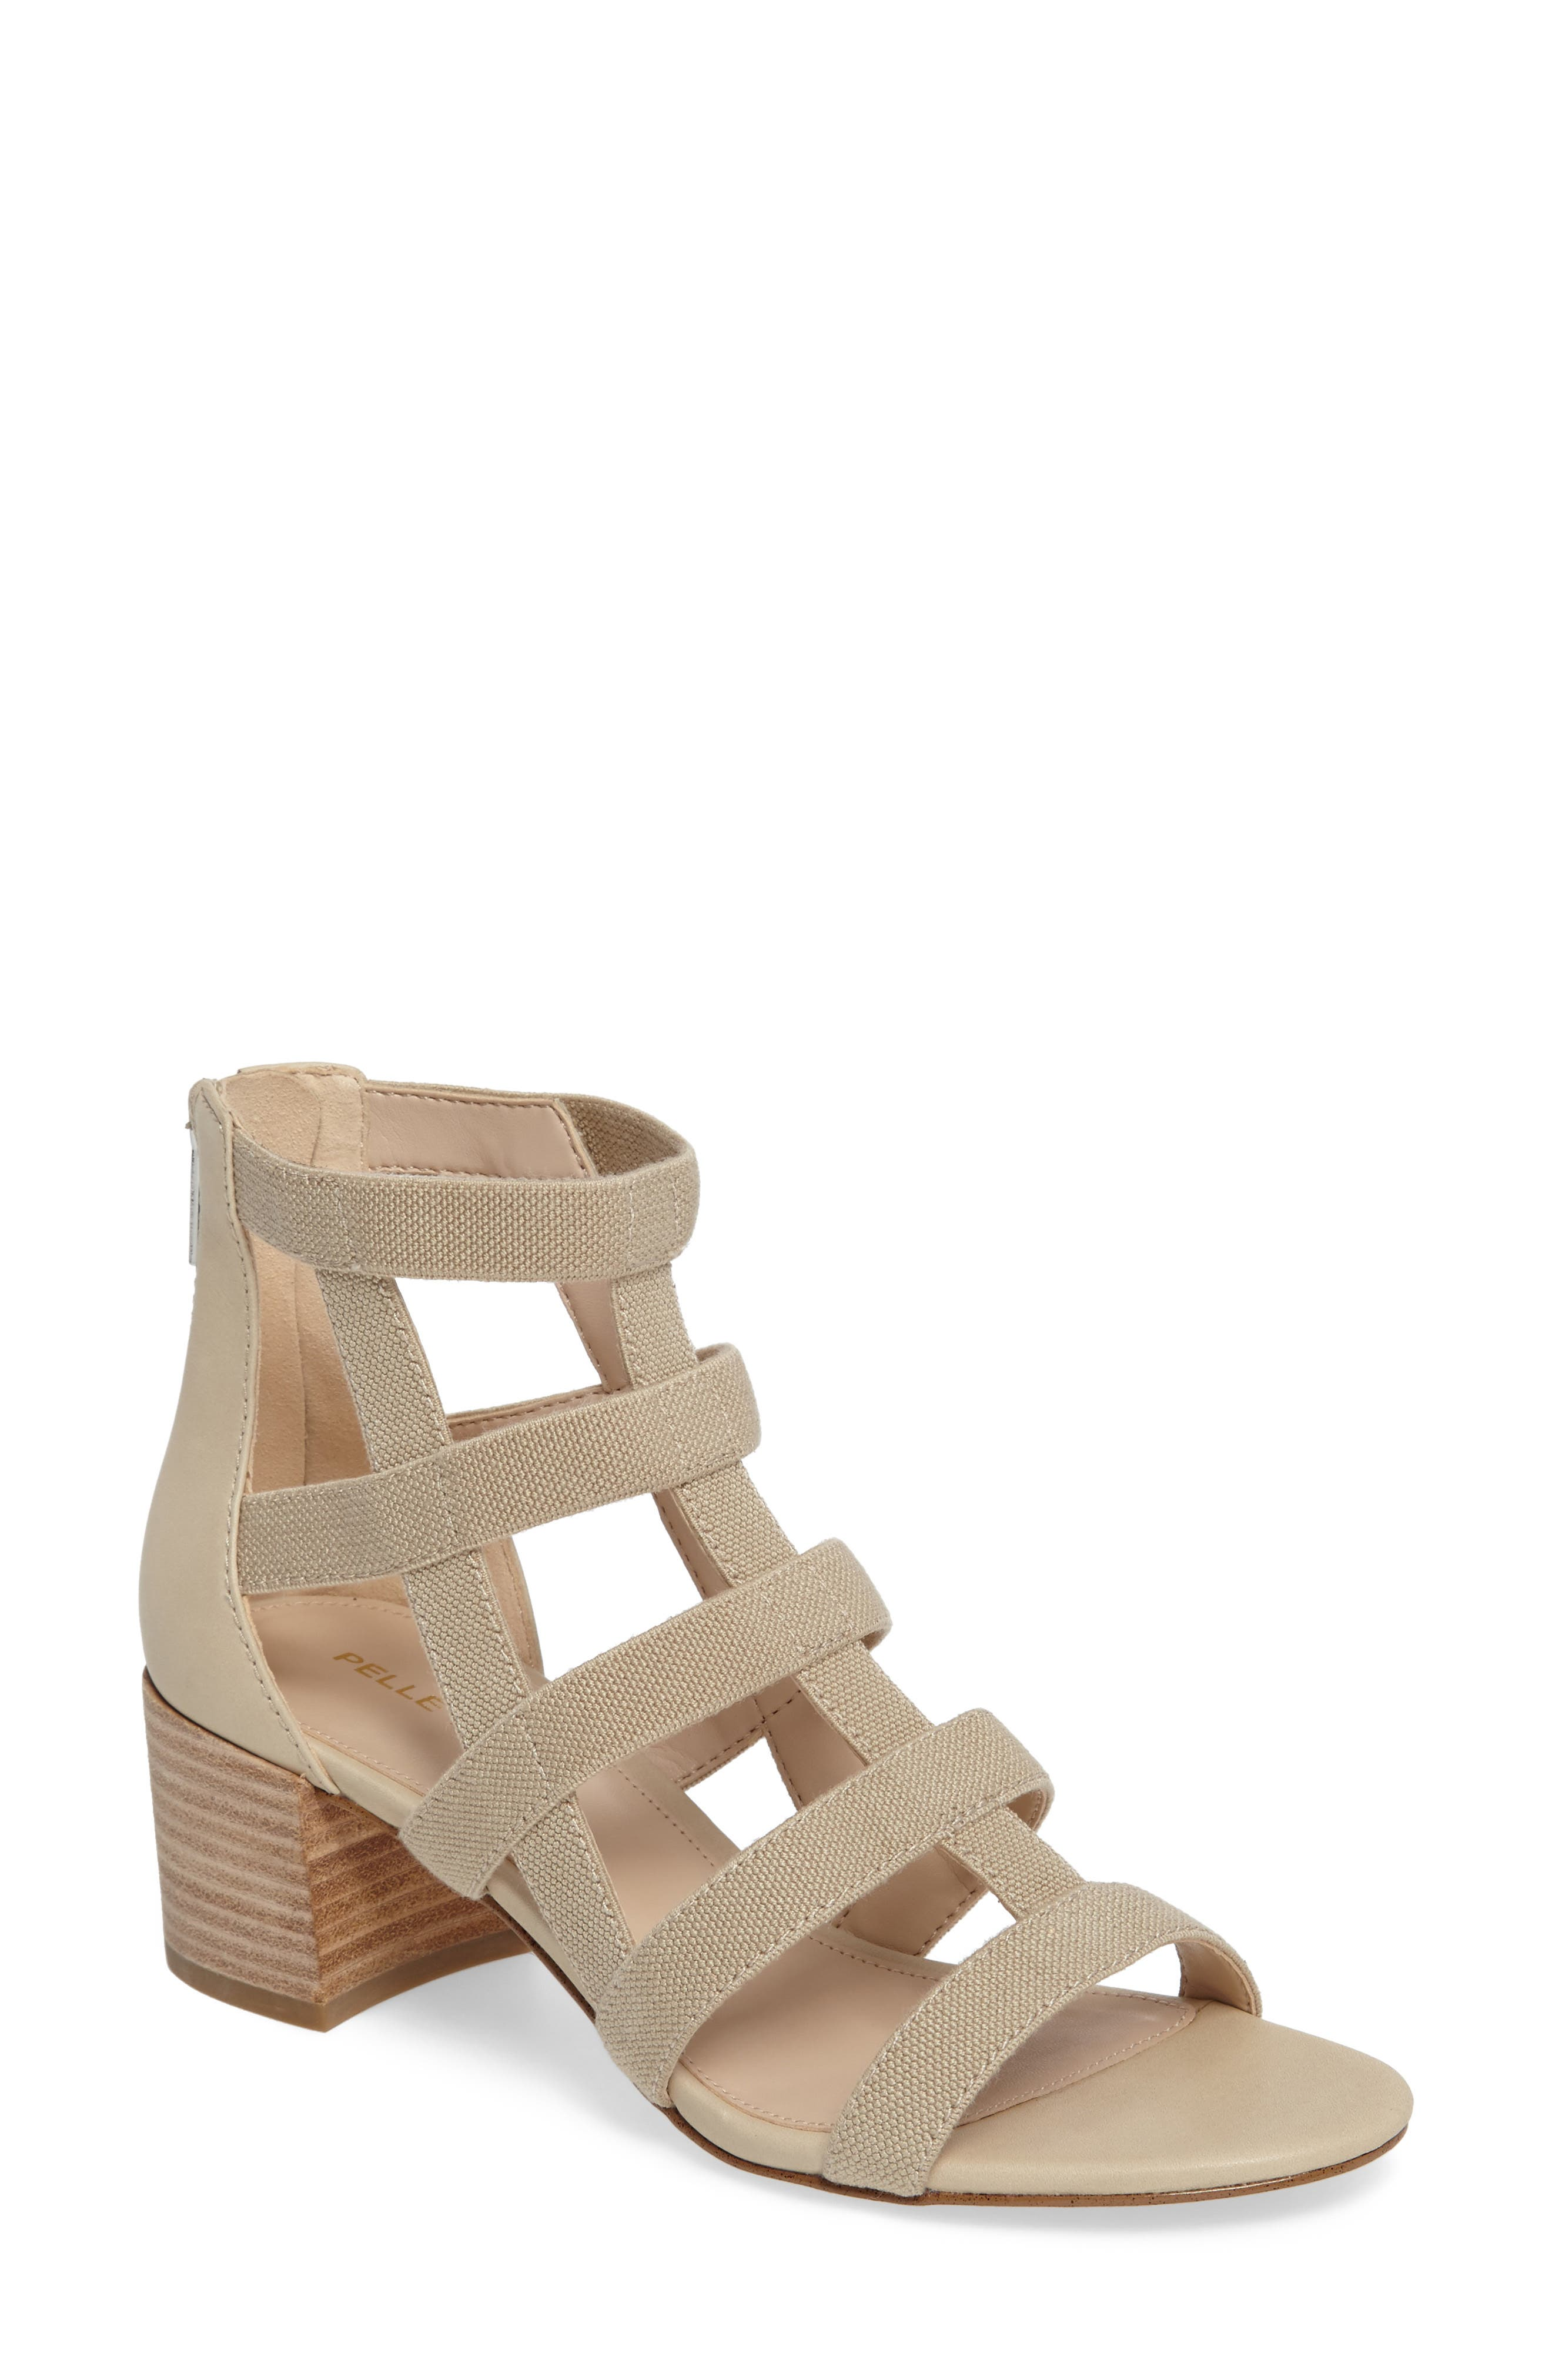 Main Image - Pelle Moda Unkar Block Heel Sandal (Women)